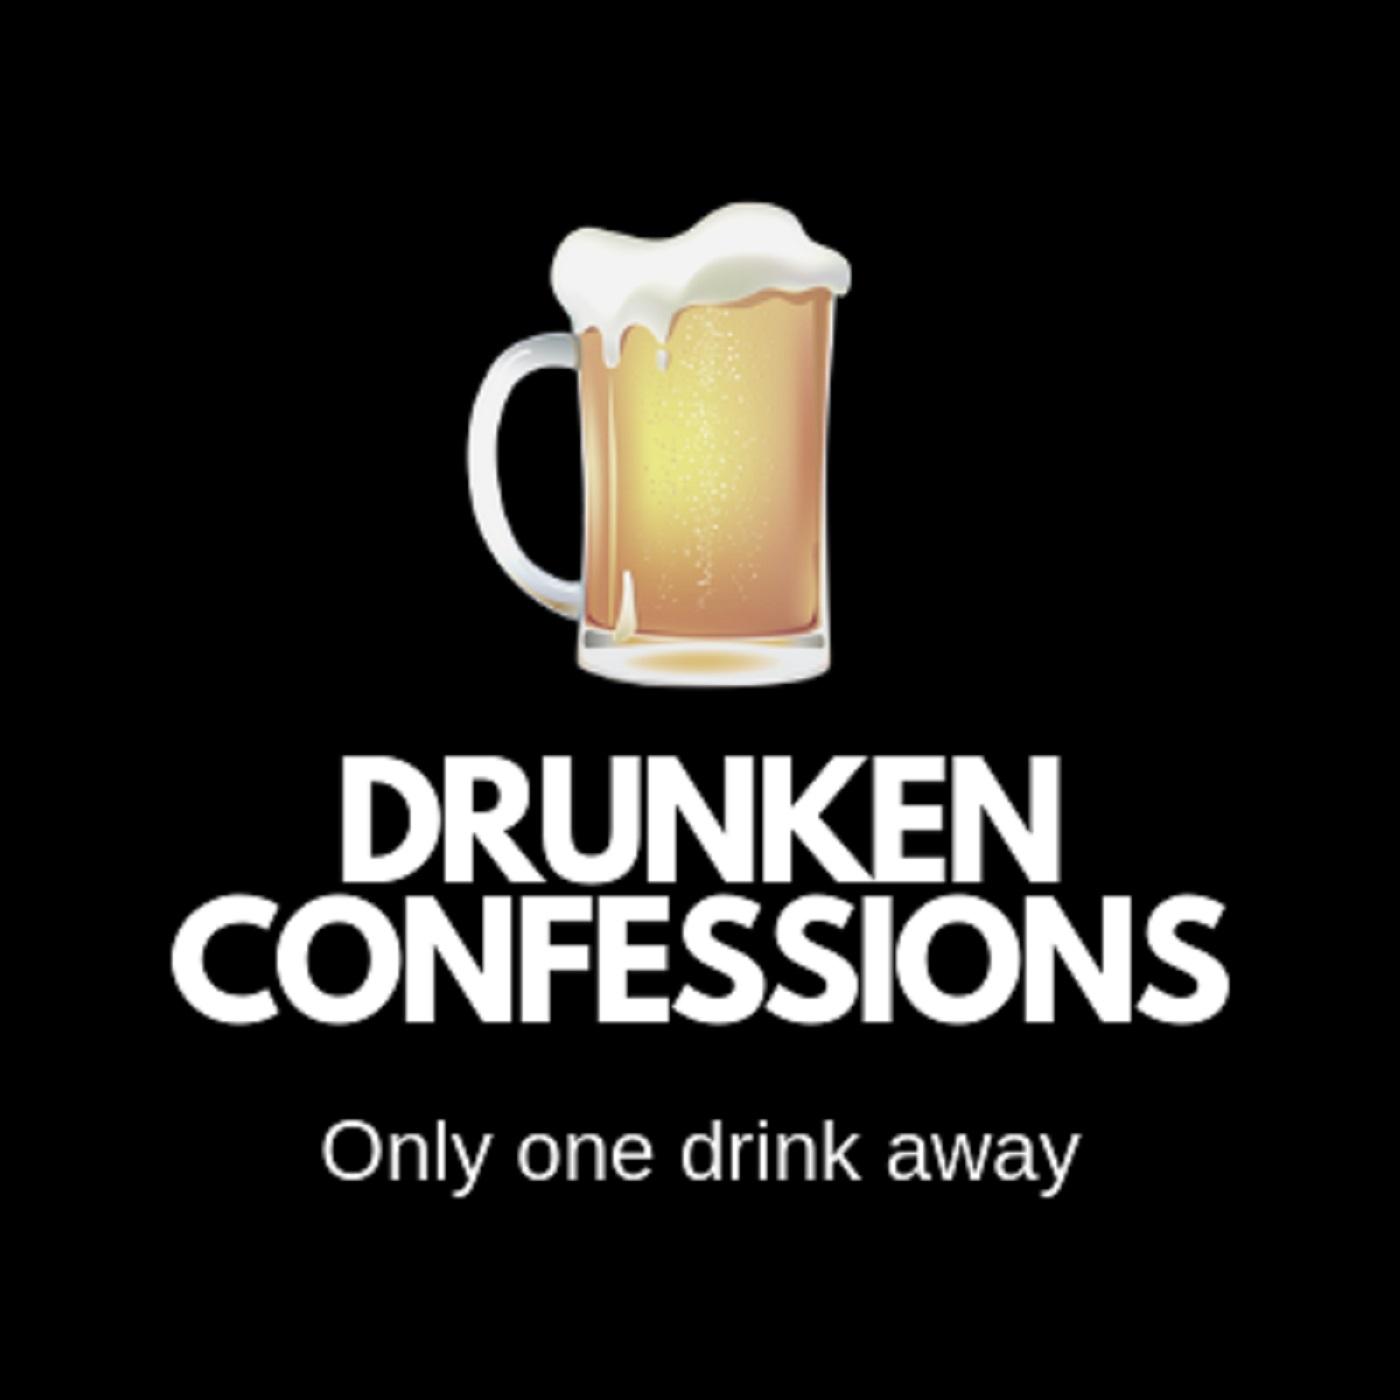 Drunken Confessions